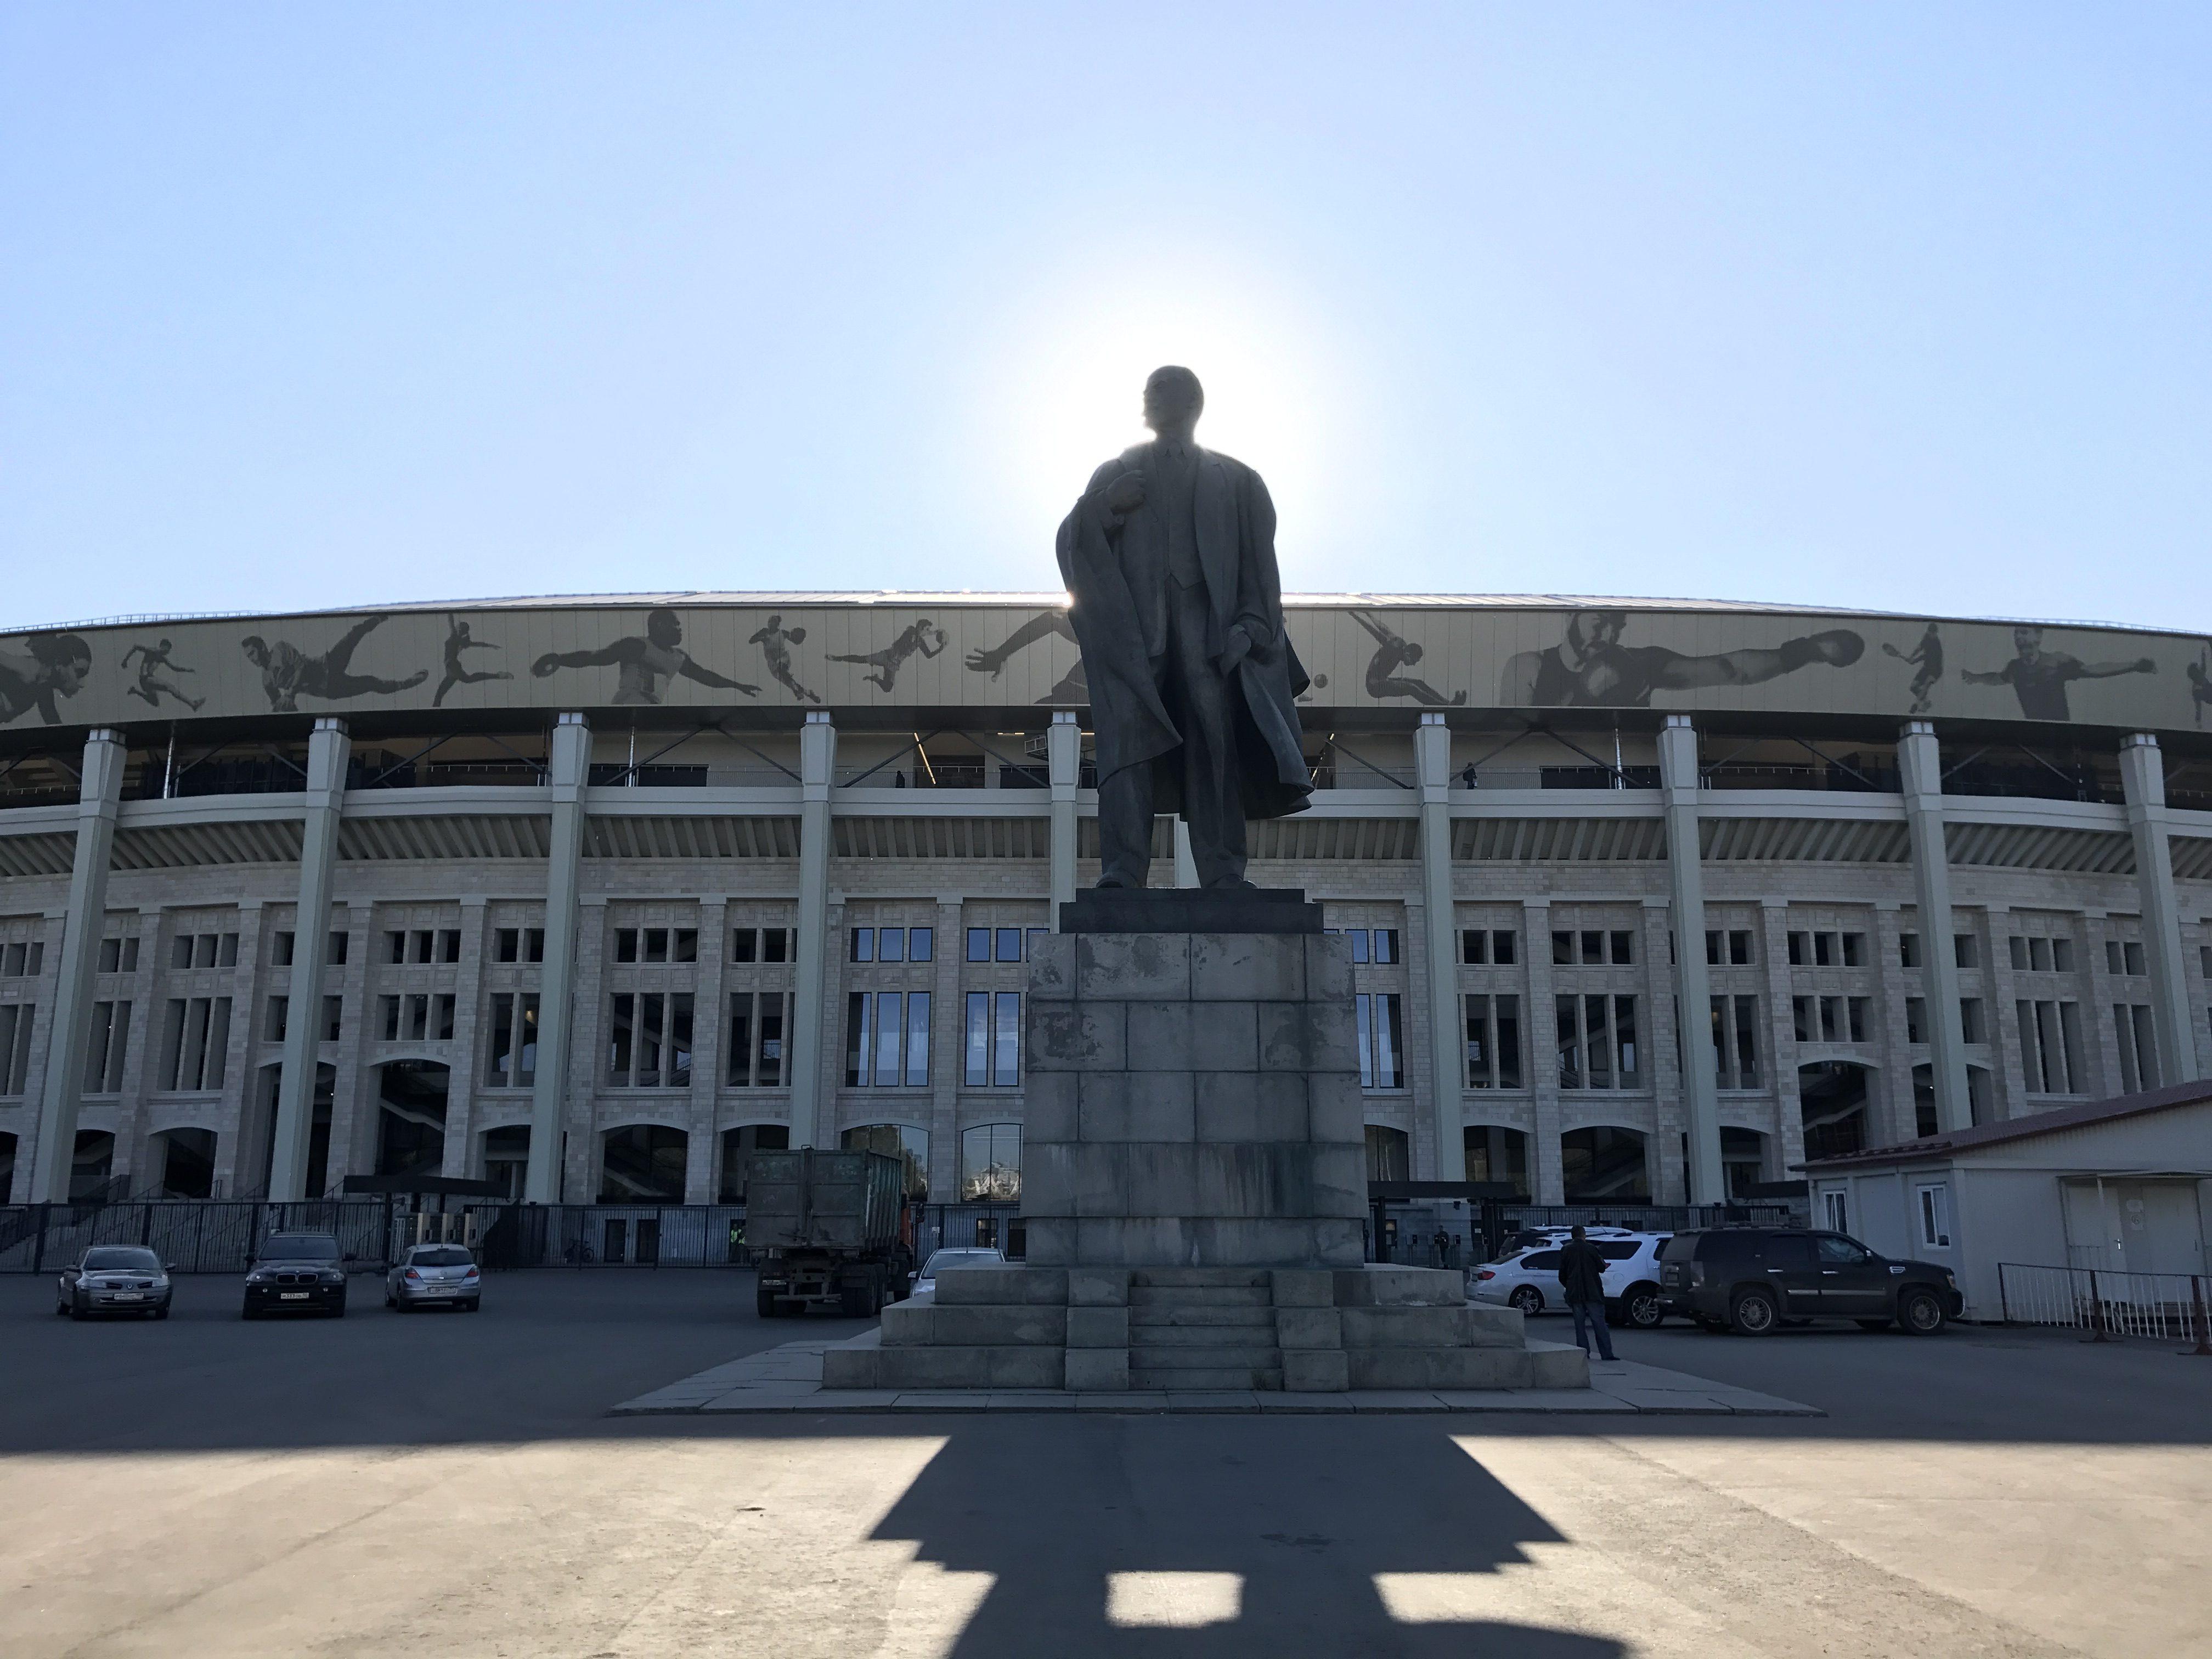 Moscovo – Estádio Lujniki e Otkrytie Arena